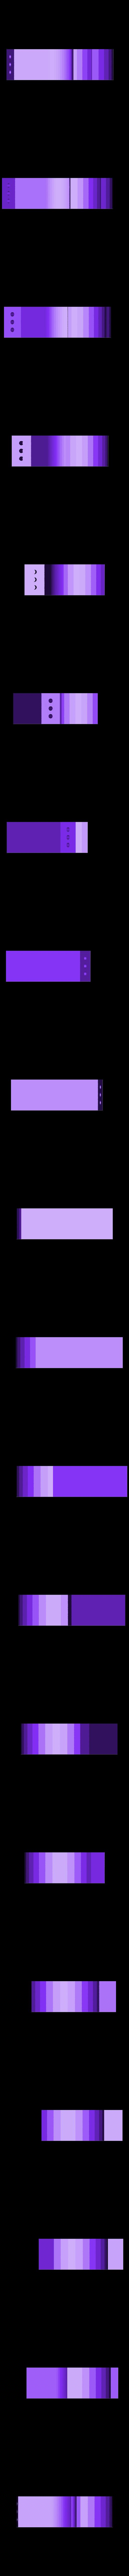 cross_piece_v4.stl Download free STL file Life-Sized Sword of Omens • 3D print template, Revalia6D